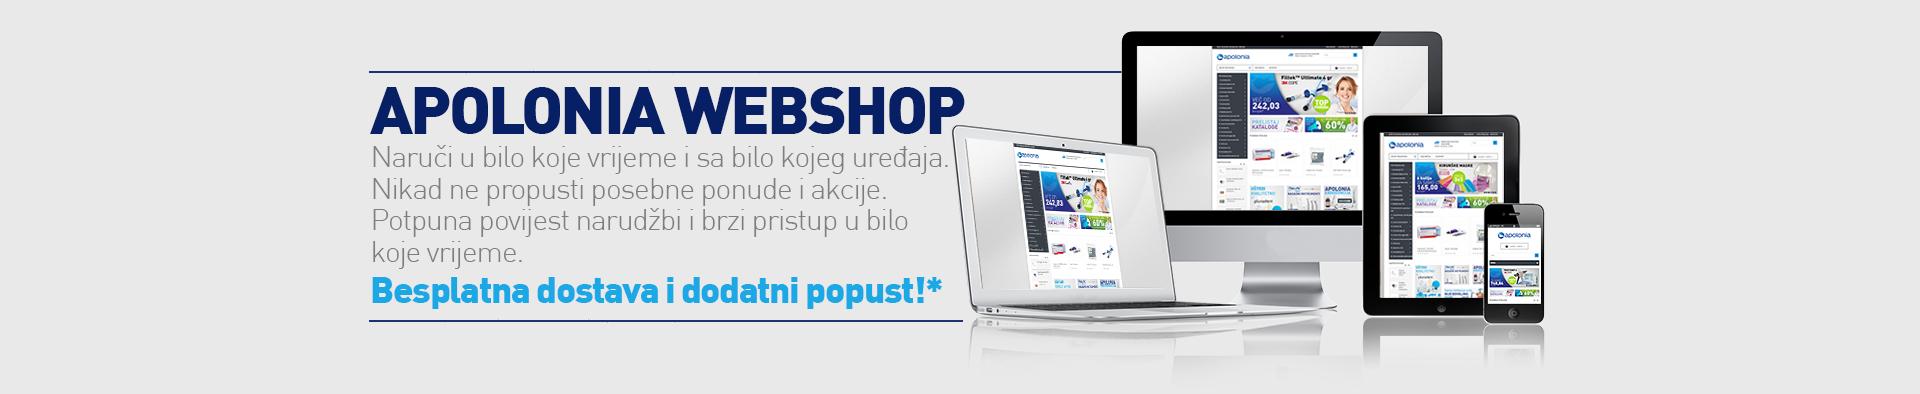 apolonia-webshop-registracija-dodatni-popusti